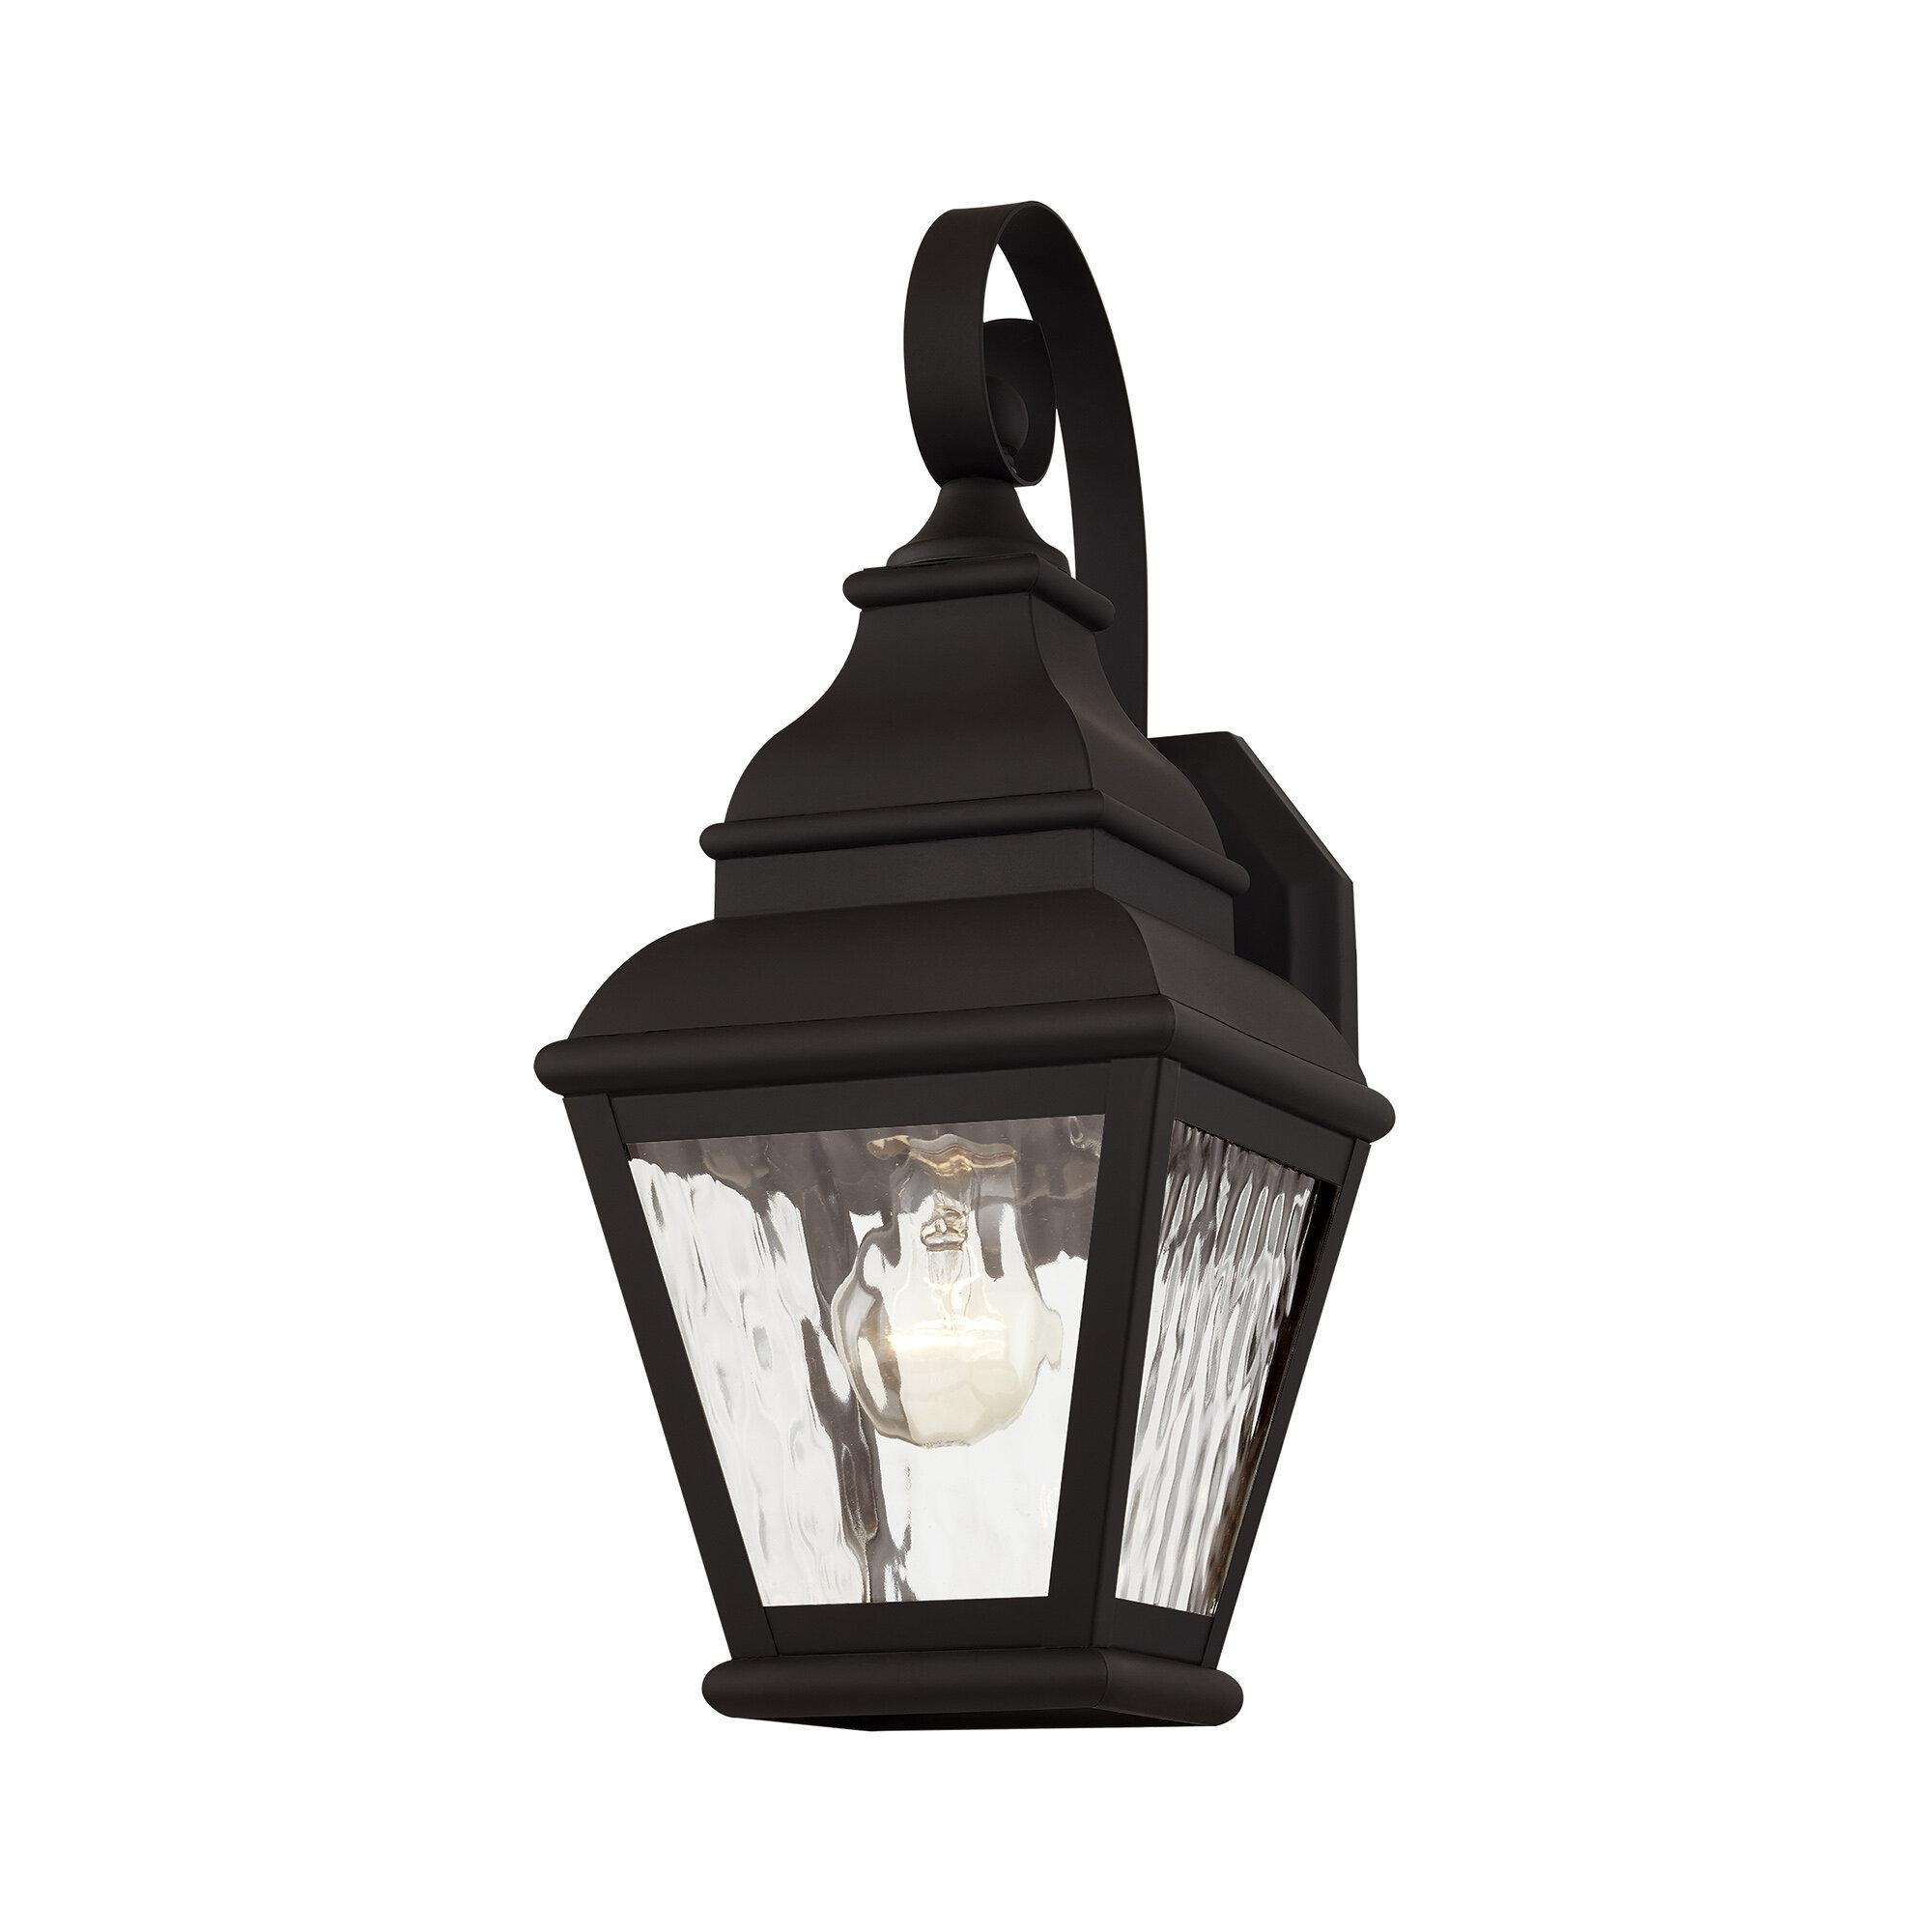 Charlton Home Acadia 1 Bulb 15 5 H Outdoor Wall Lantern Wayfair